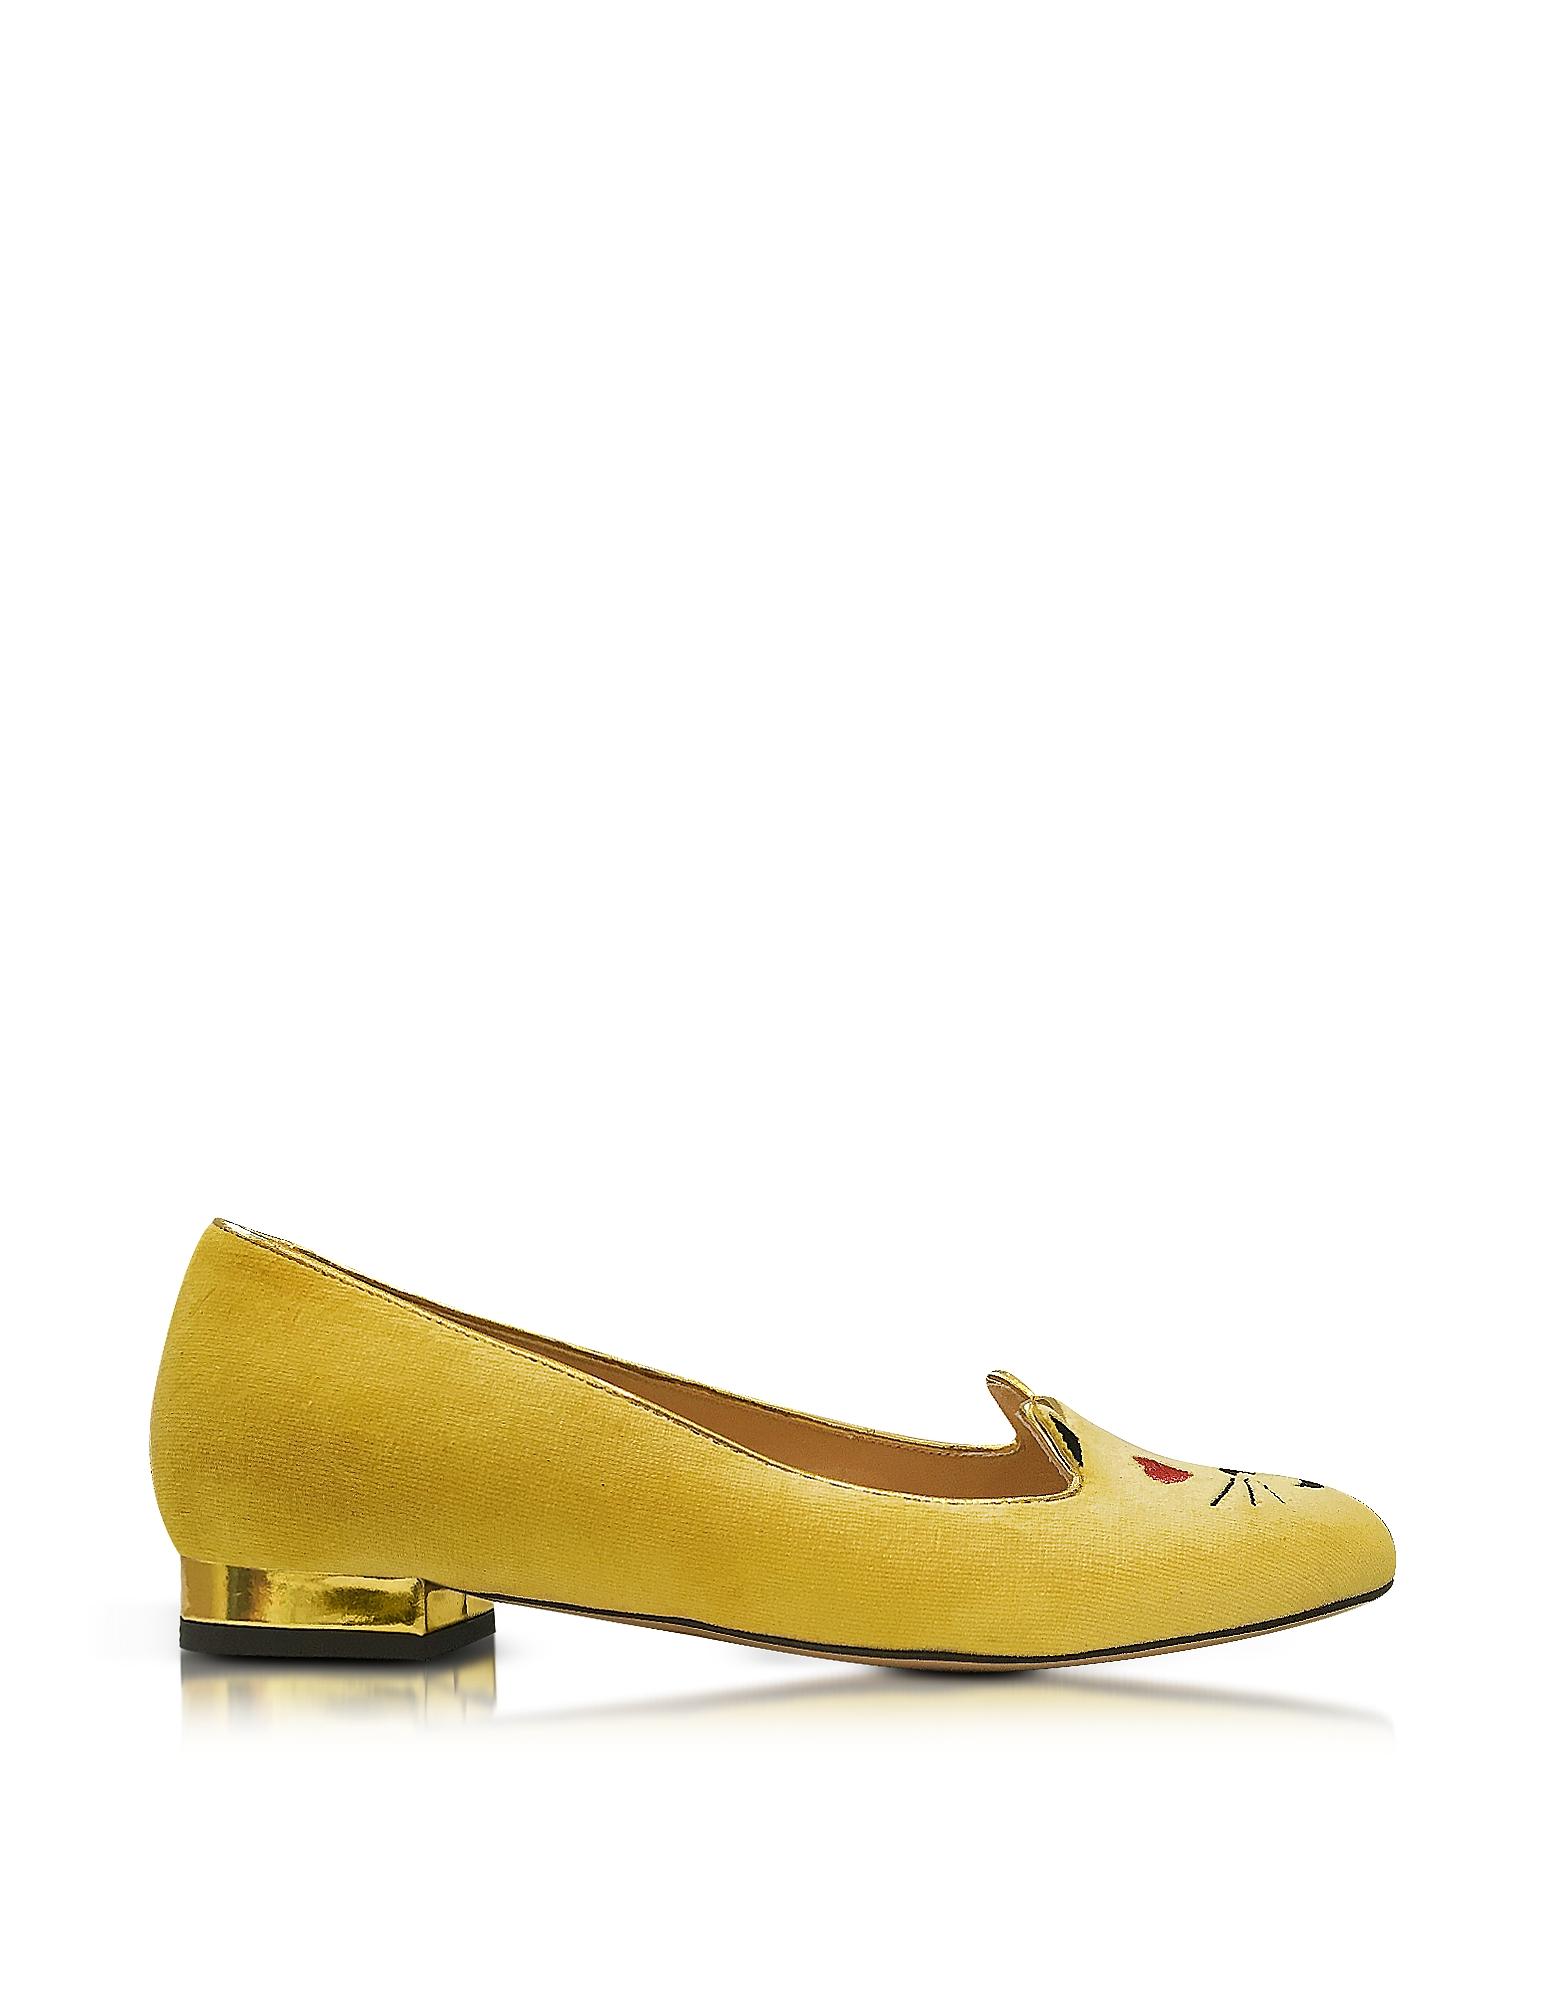 Emoticats Flirty Kitty - Желтые Бархатные Туфли на Плоской Подошве